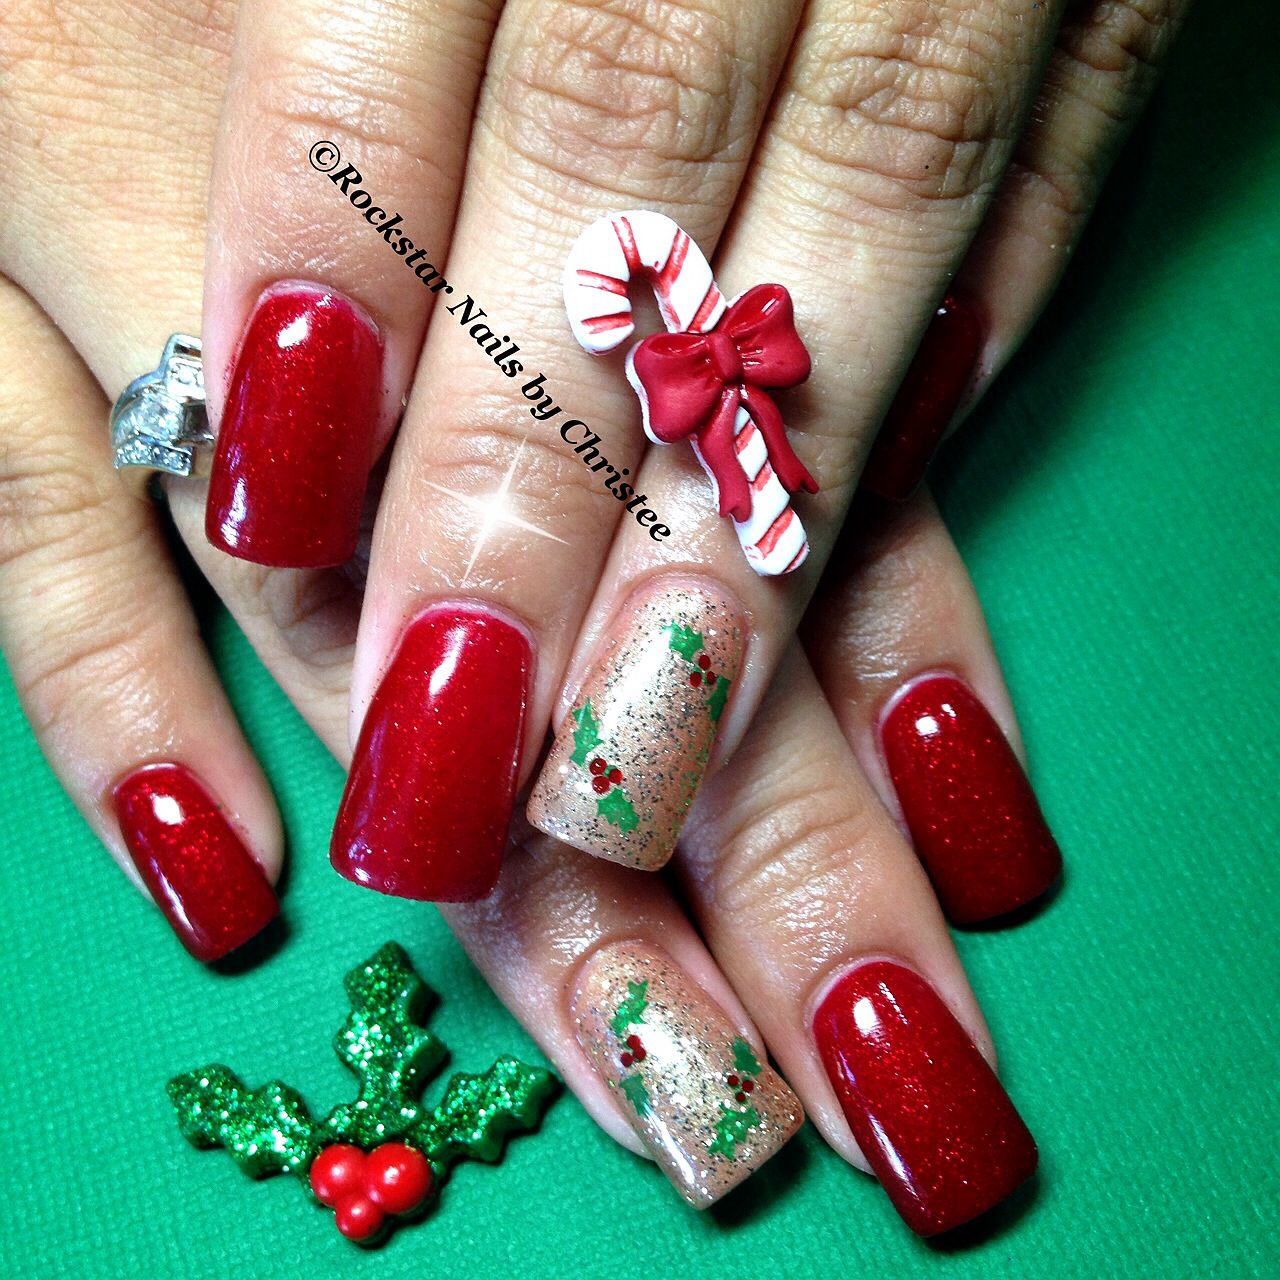 New Rockstar Acrylic Nail Designs: #rockstar_nails_by_christee #acrylic #acrylicnails